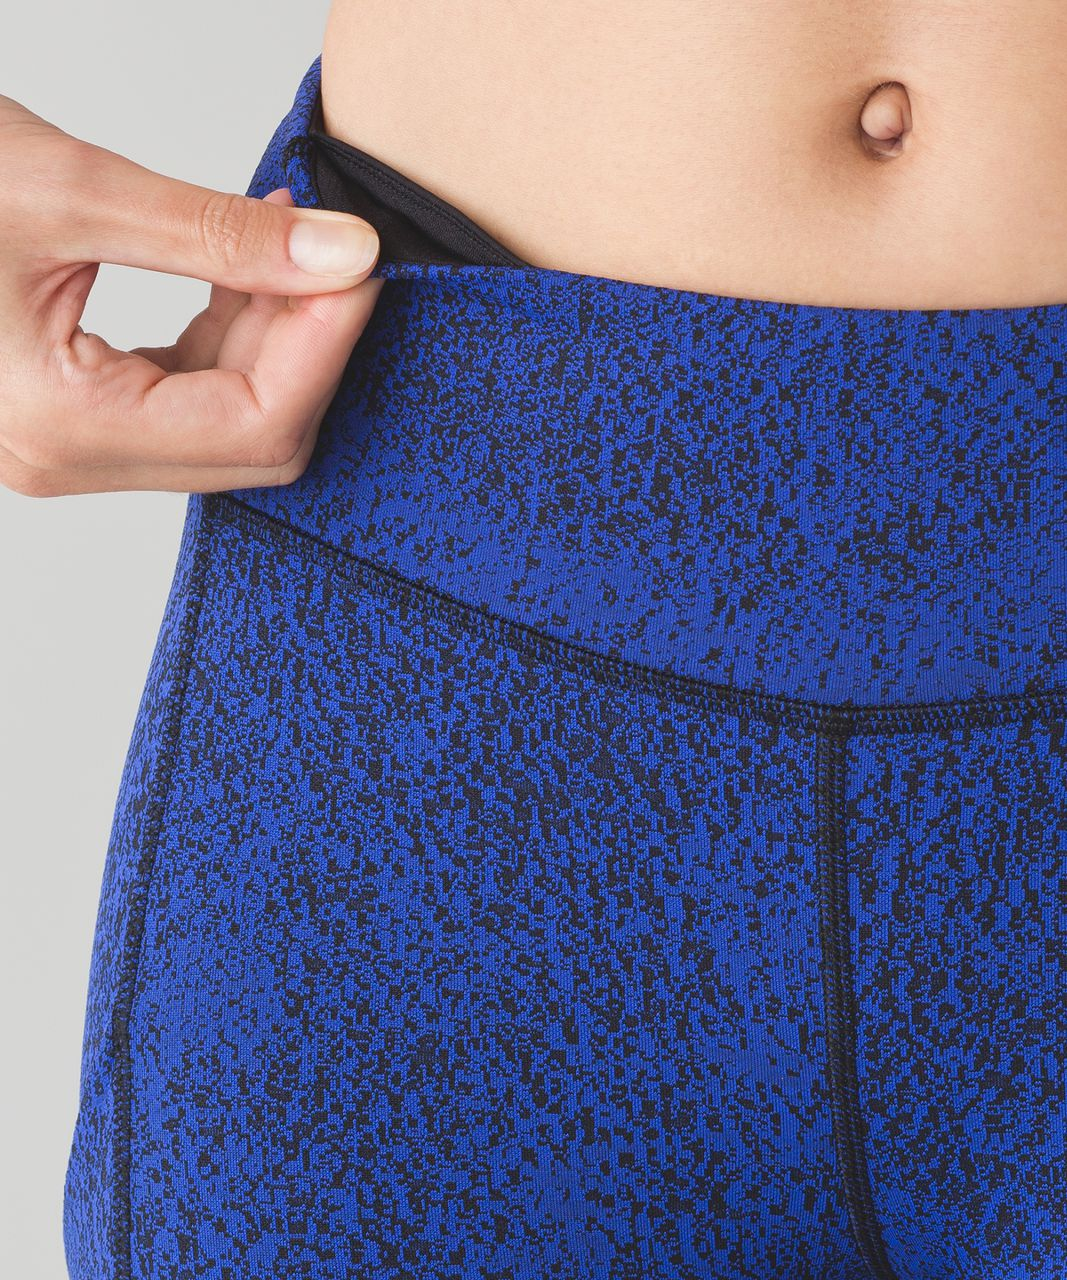 Lululemon Speed Tight V - Power Luxtreme Spray Jacquard Sapphire Blue Black / Black